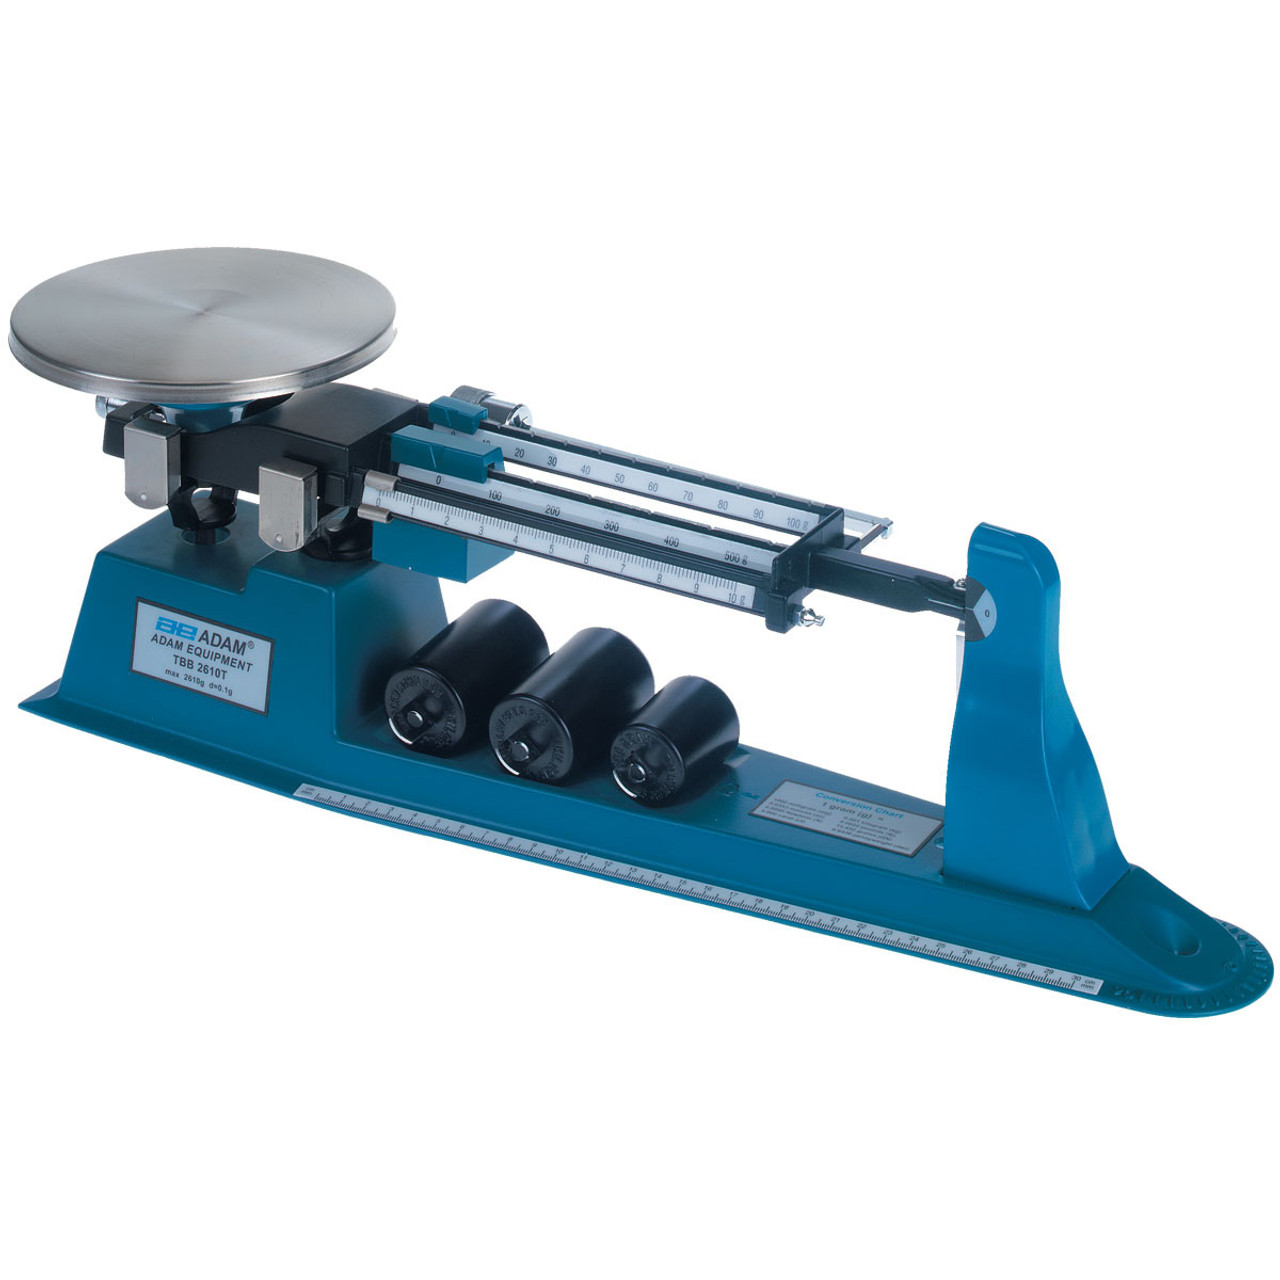 Laboratory balance scale, Single pan, triple beam, soft move quick balance.